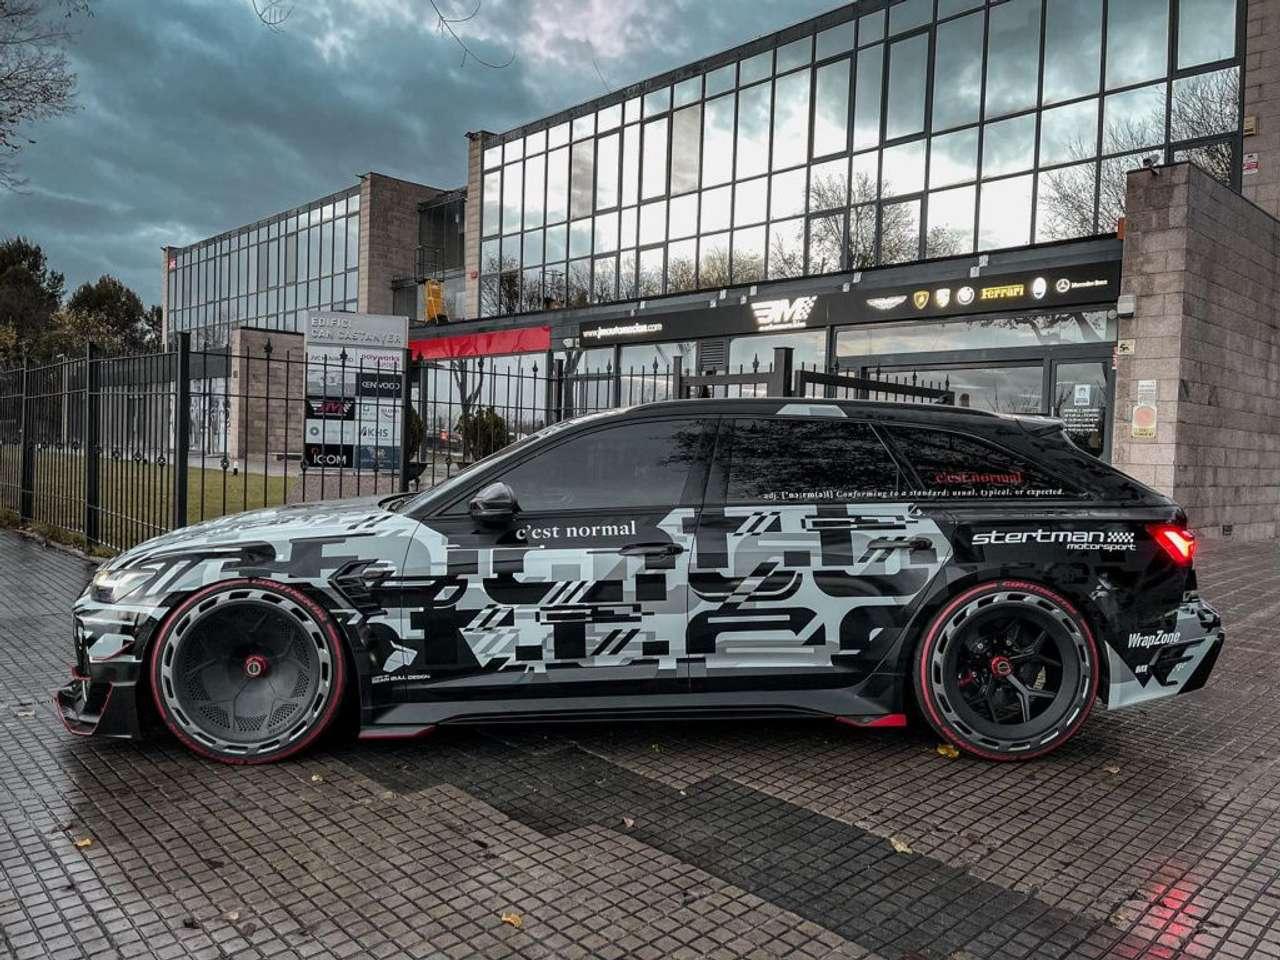 Audi-RS6-Jon-Olsson-for-sale-24